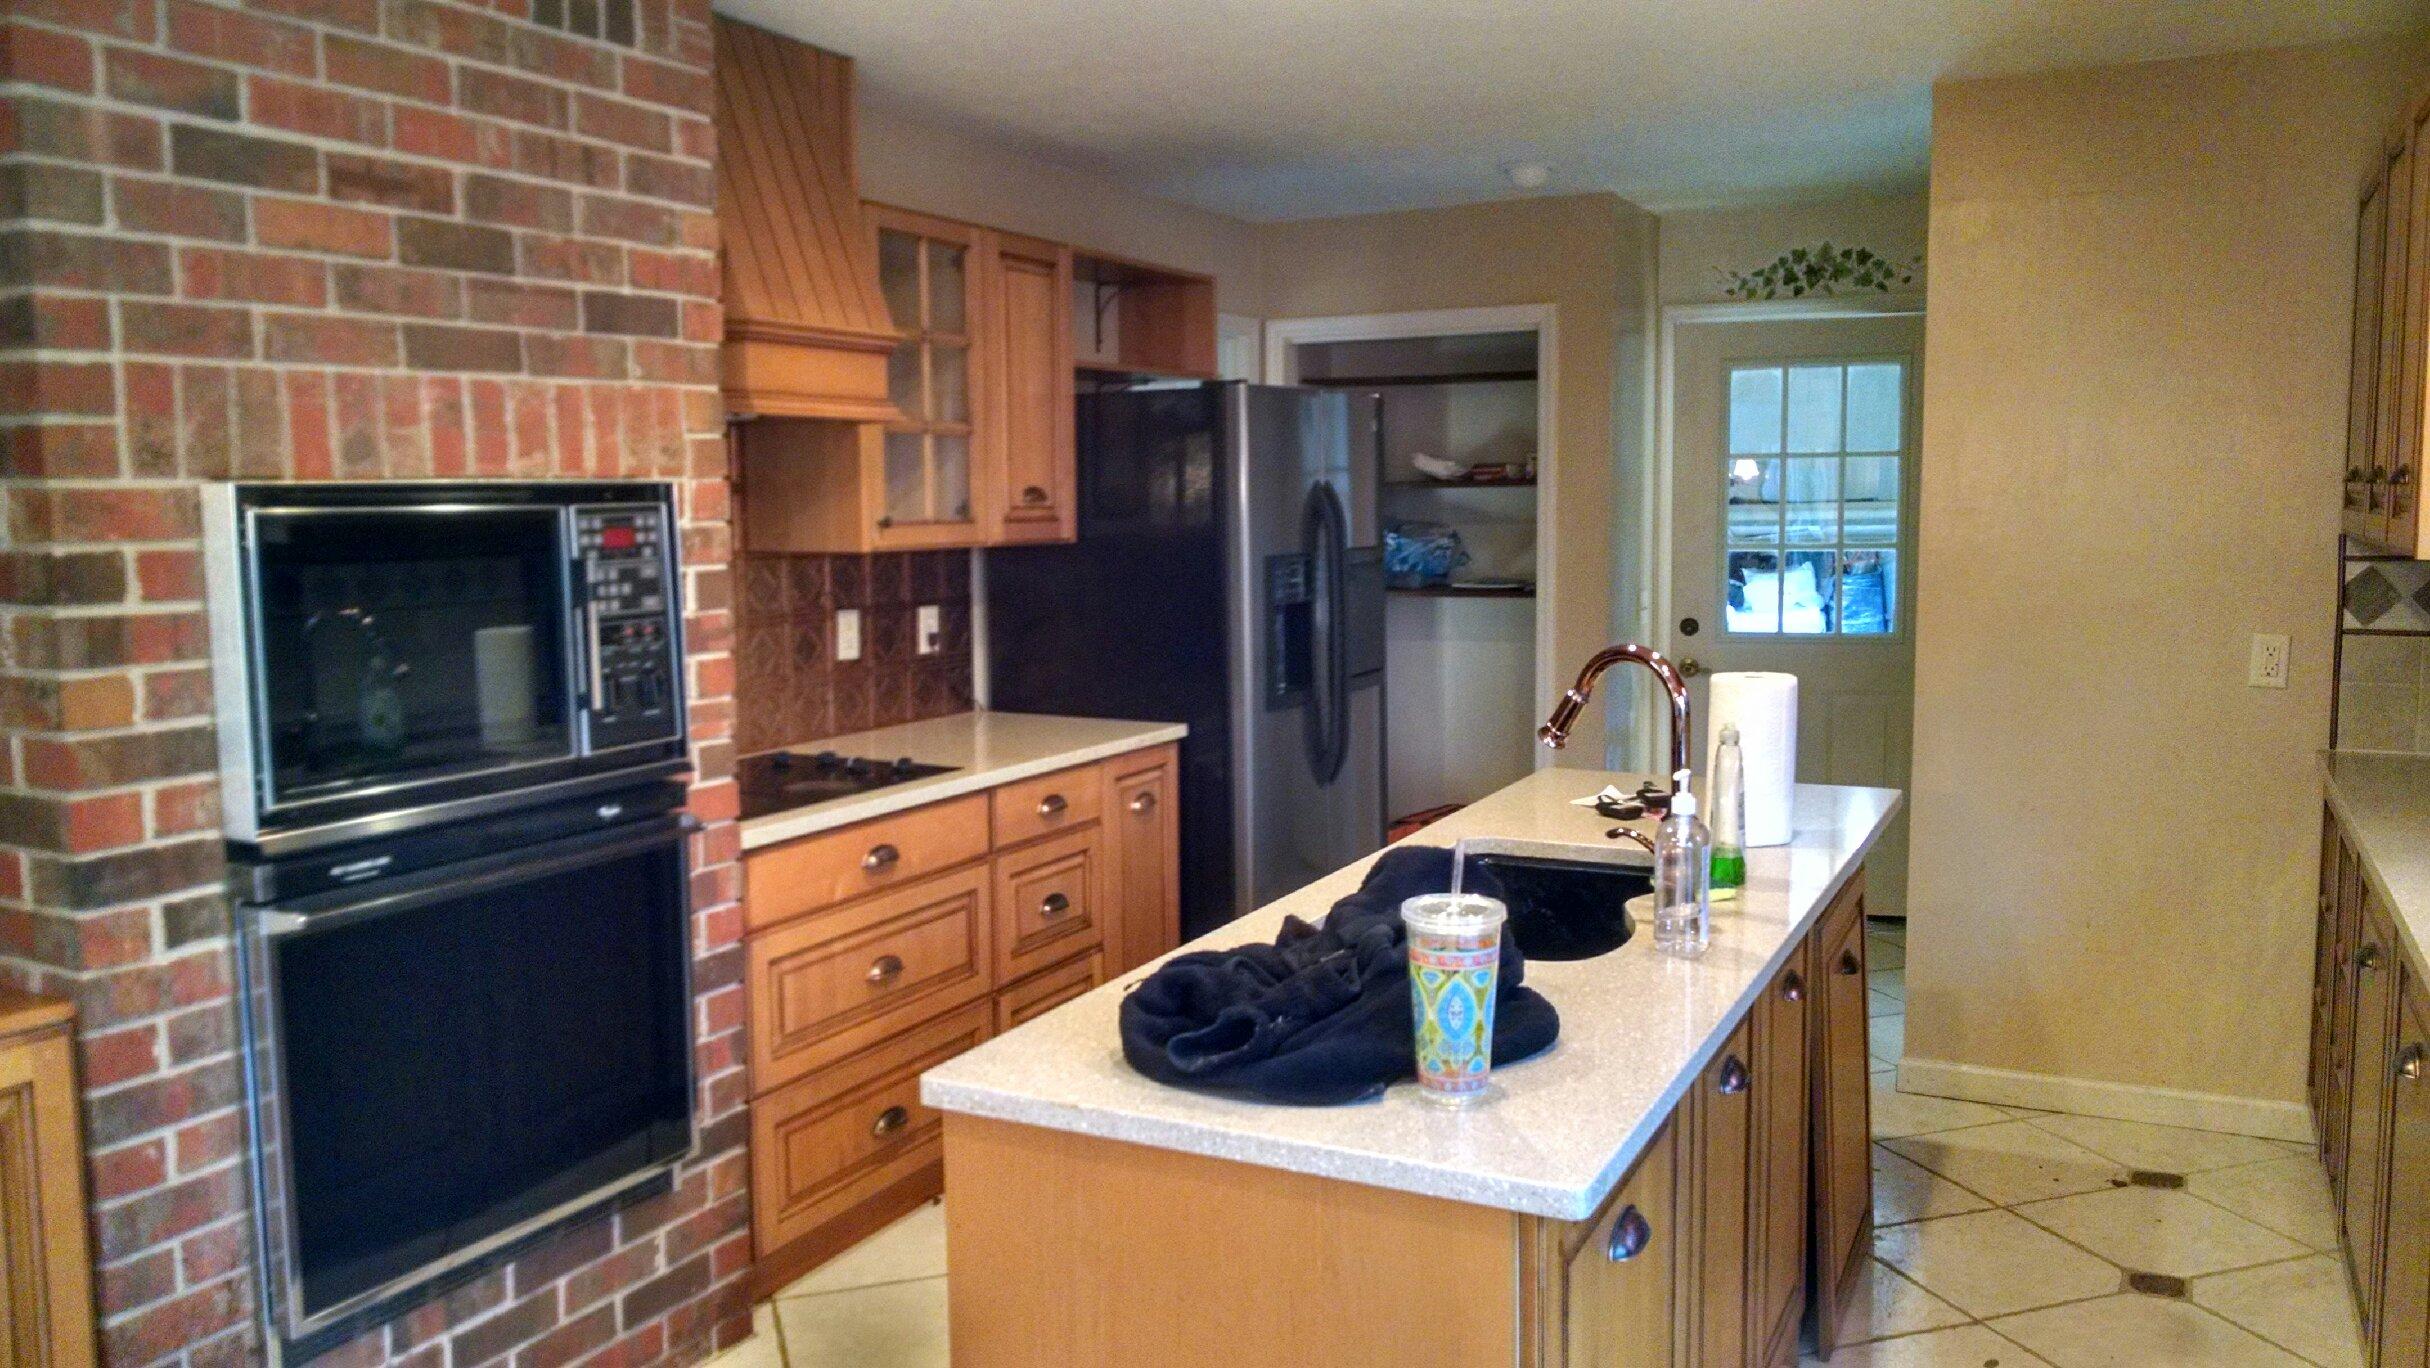 ideas bathroom door doors and pantry sliding for barns barn designs homebnc versailles barnyard best